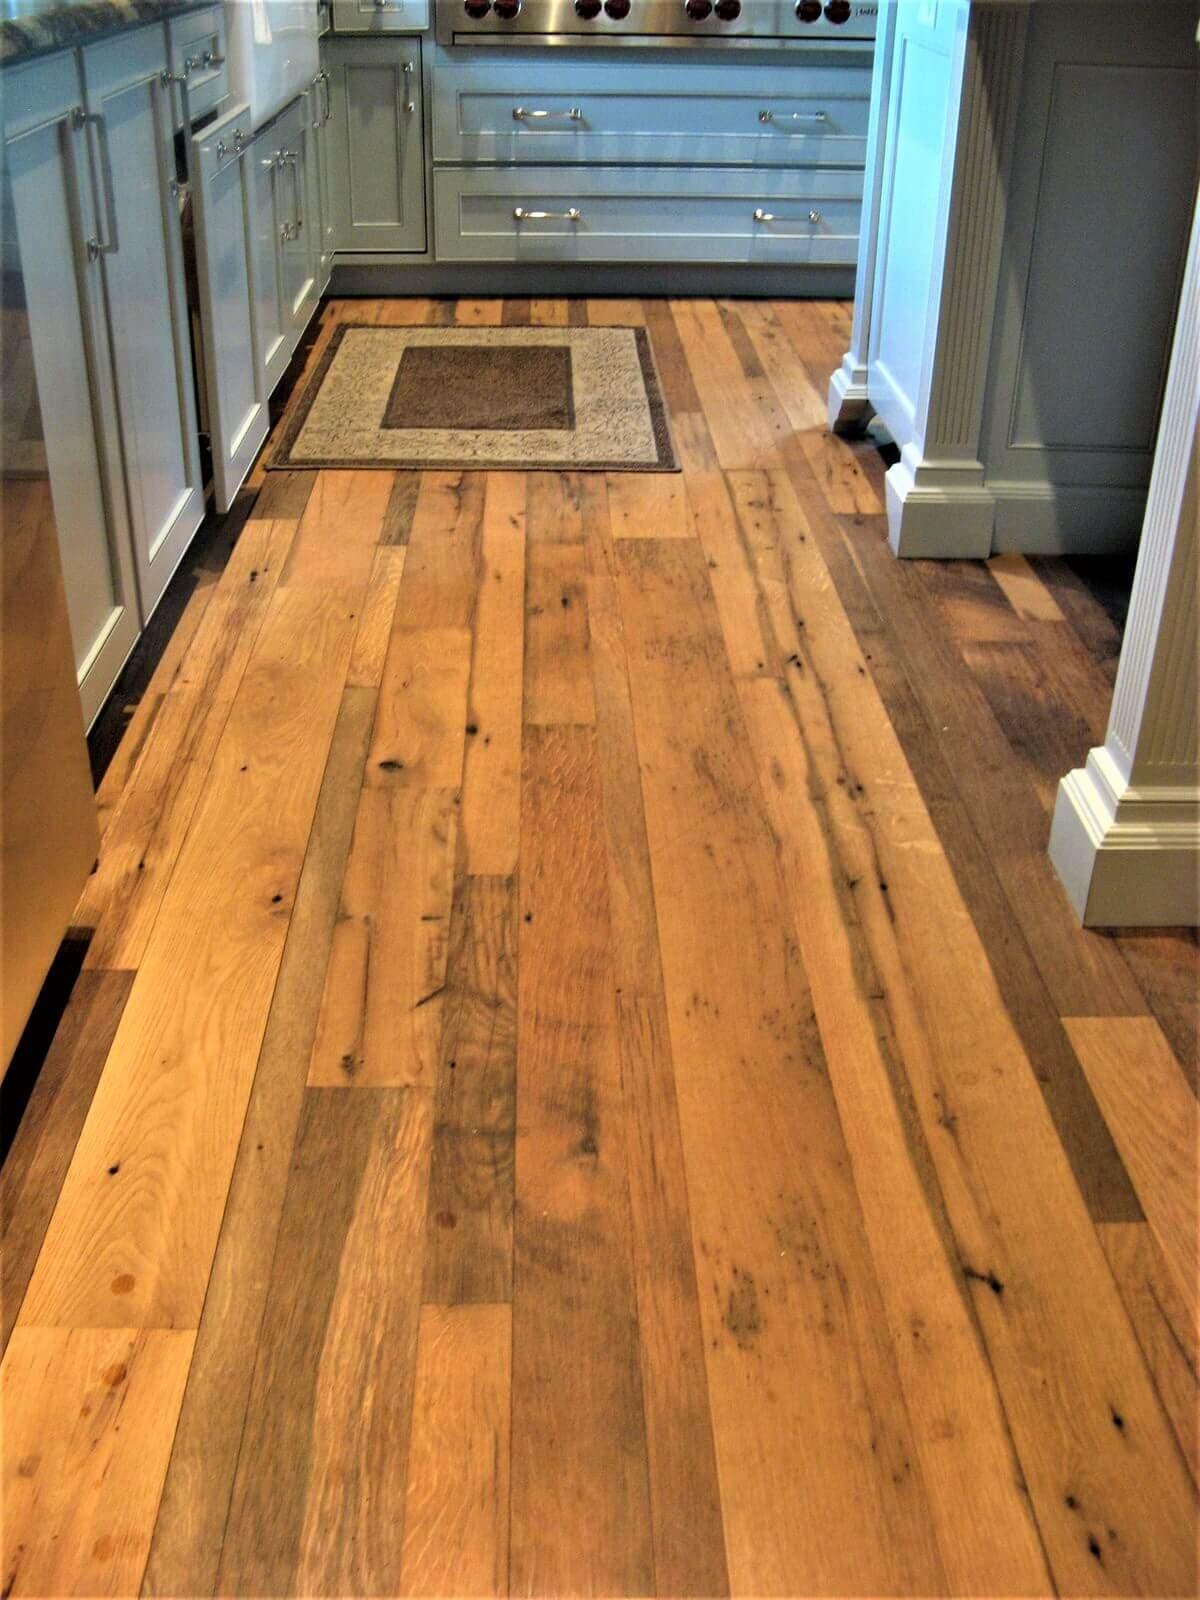 Antique white oak flooring in Spartanburg South Carolina residence.